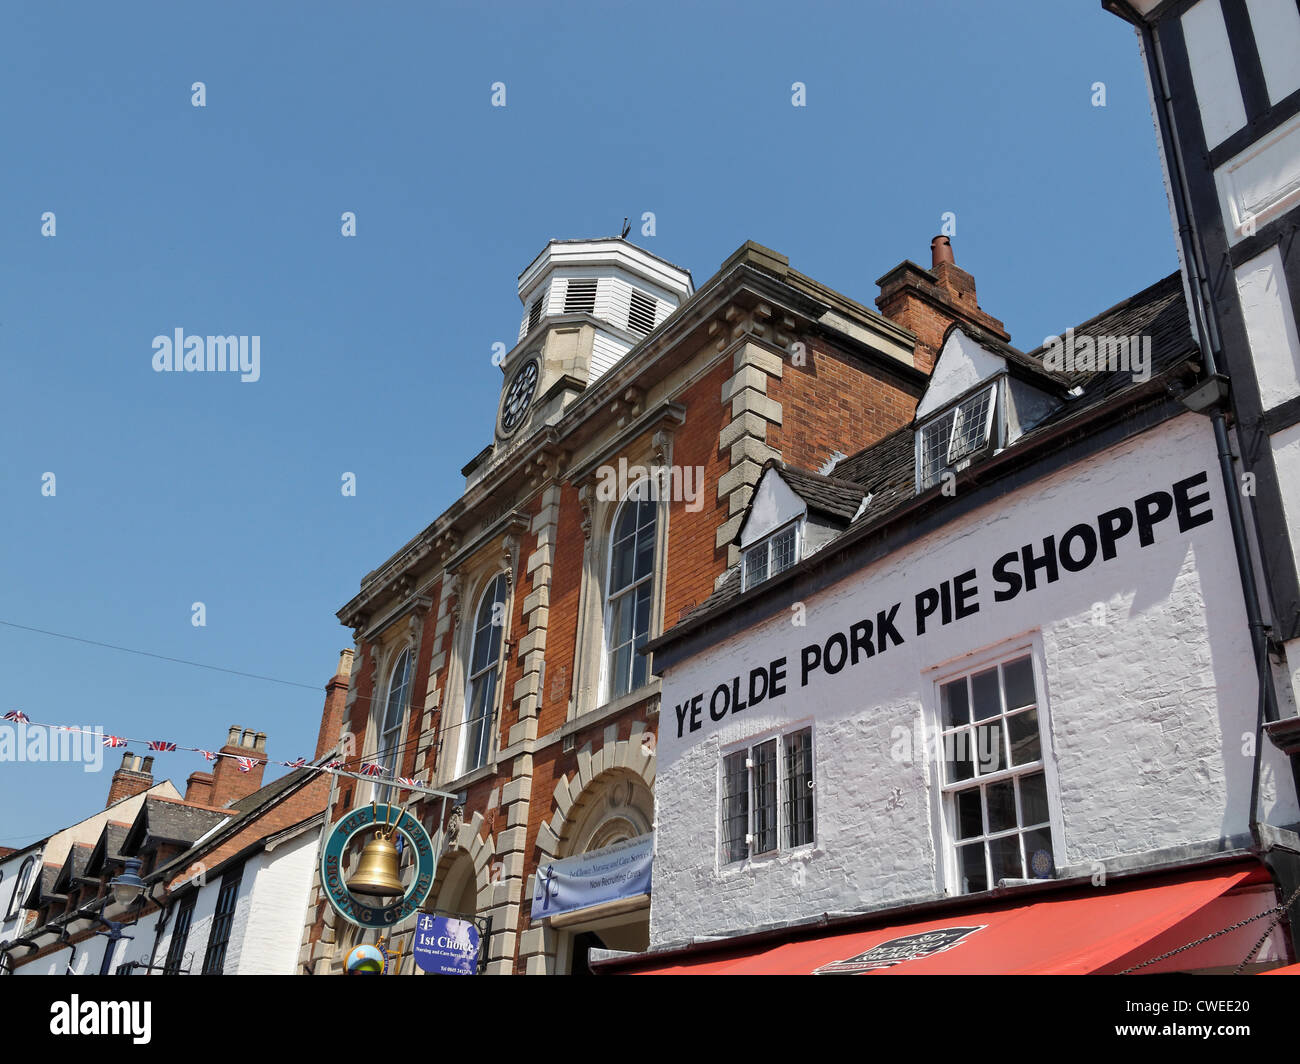 The 'Ye Olde Pork Pie Shoppe', Melton Mowbray, Leicestershire, England. - Stock Image